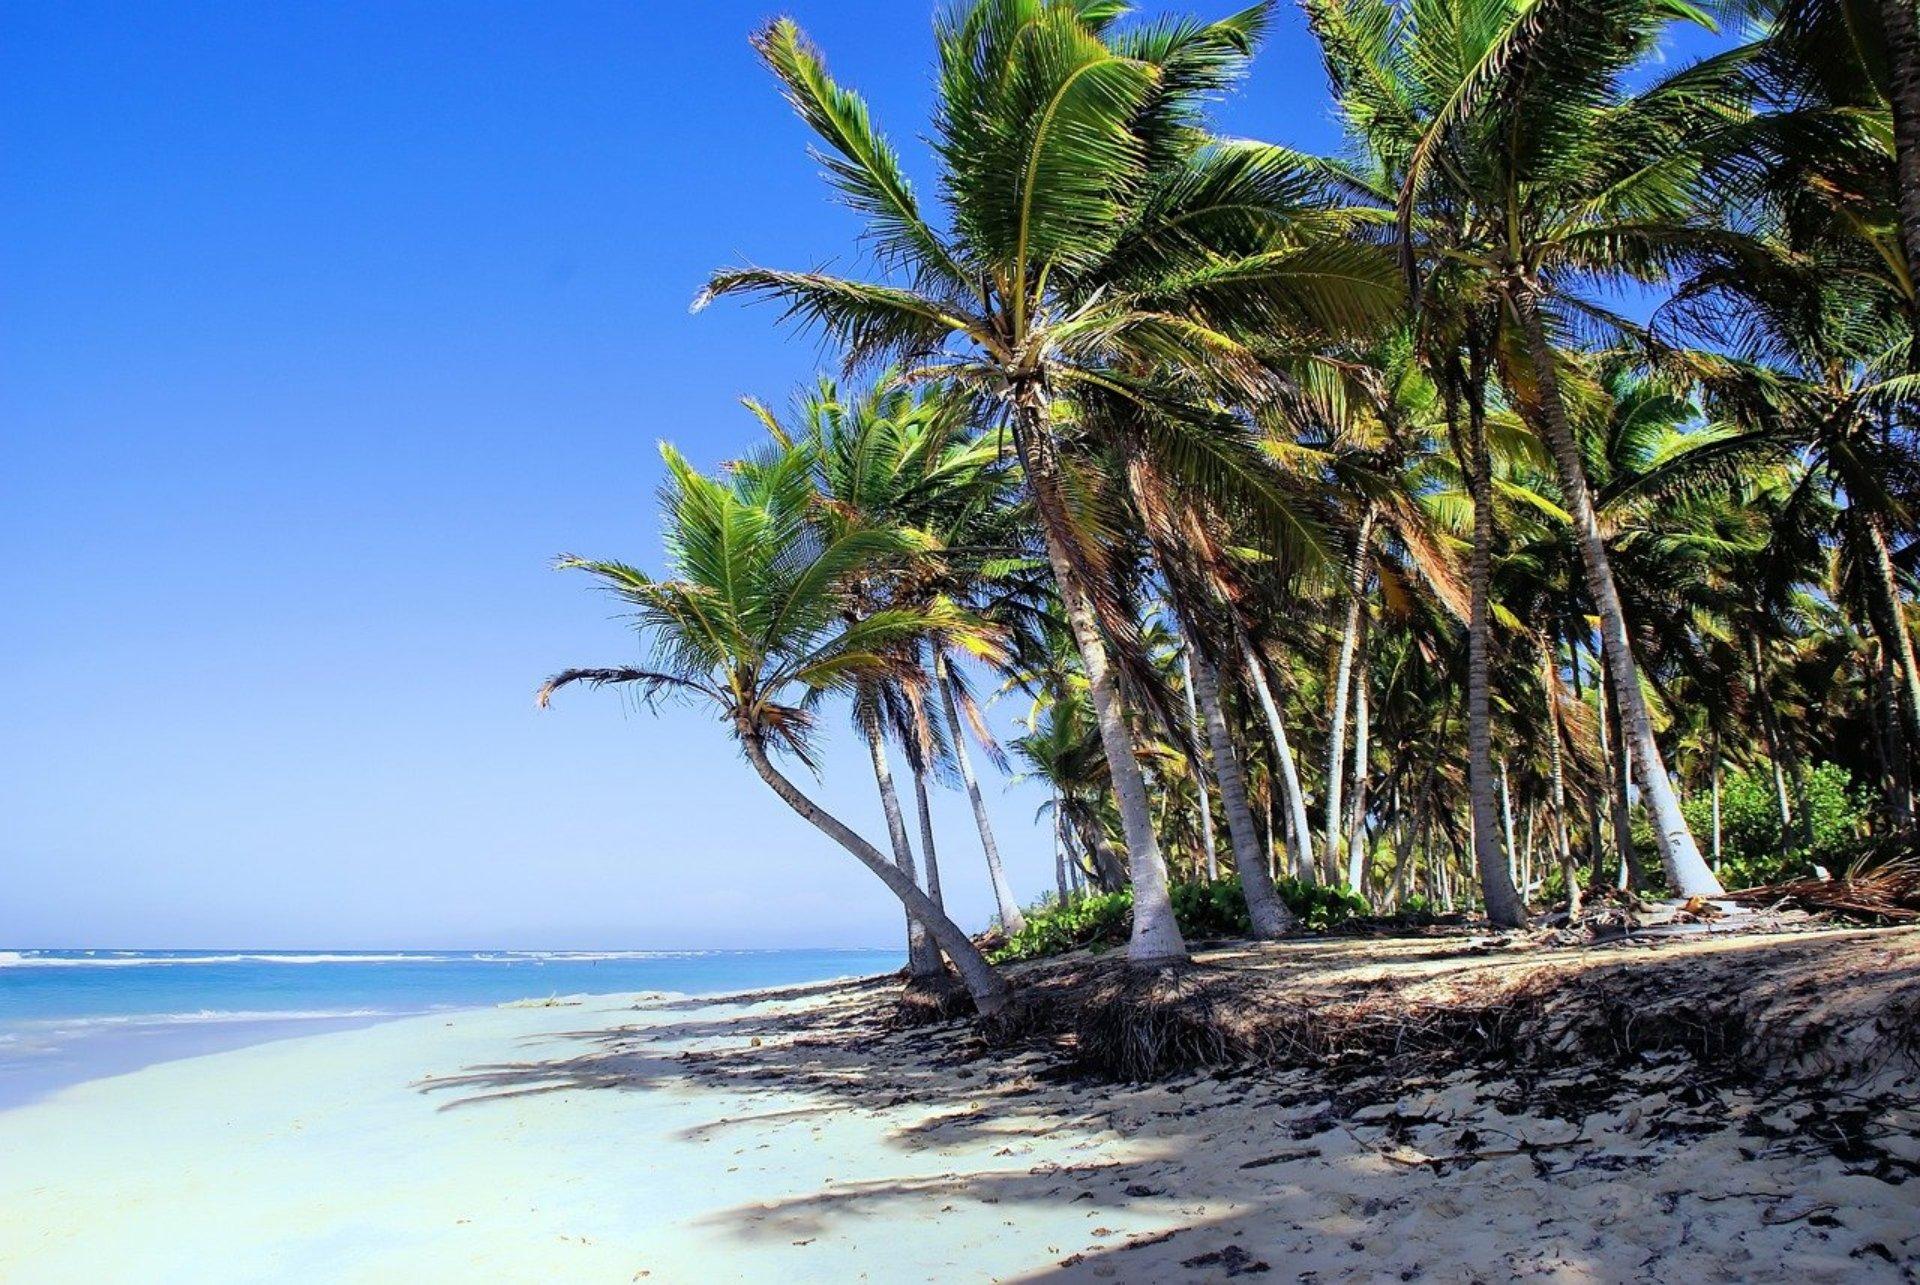 mejores-playas-de-punta-cana.jpg